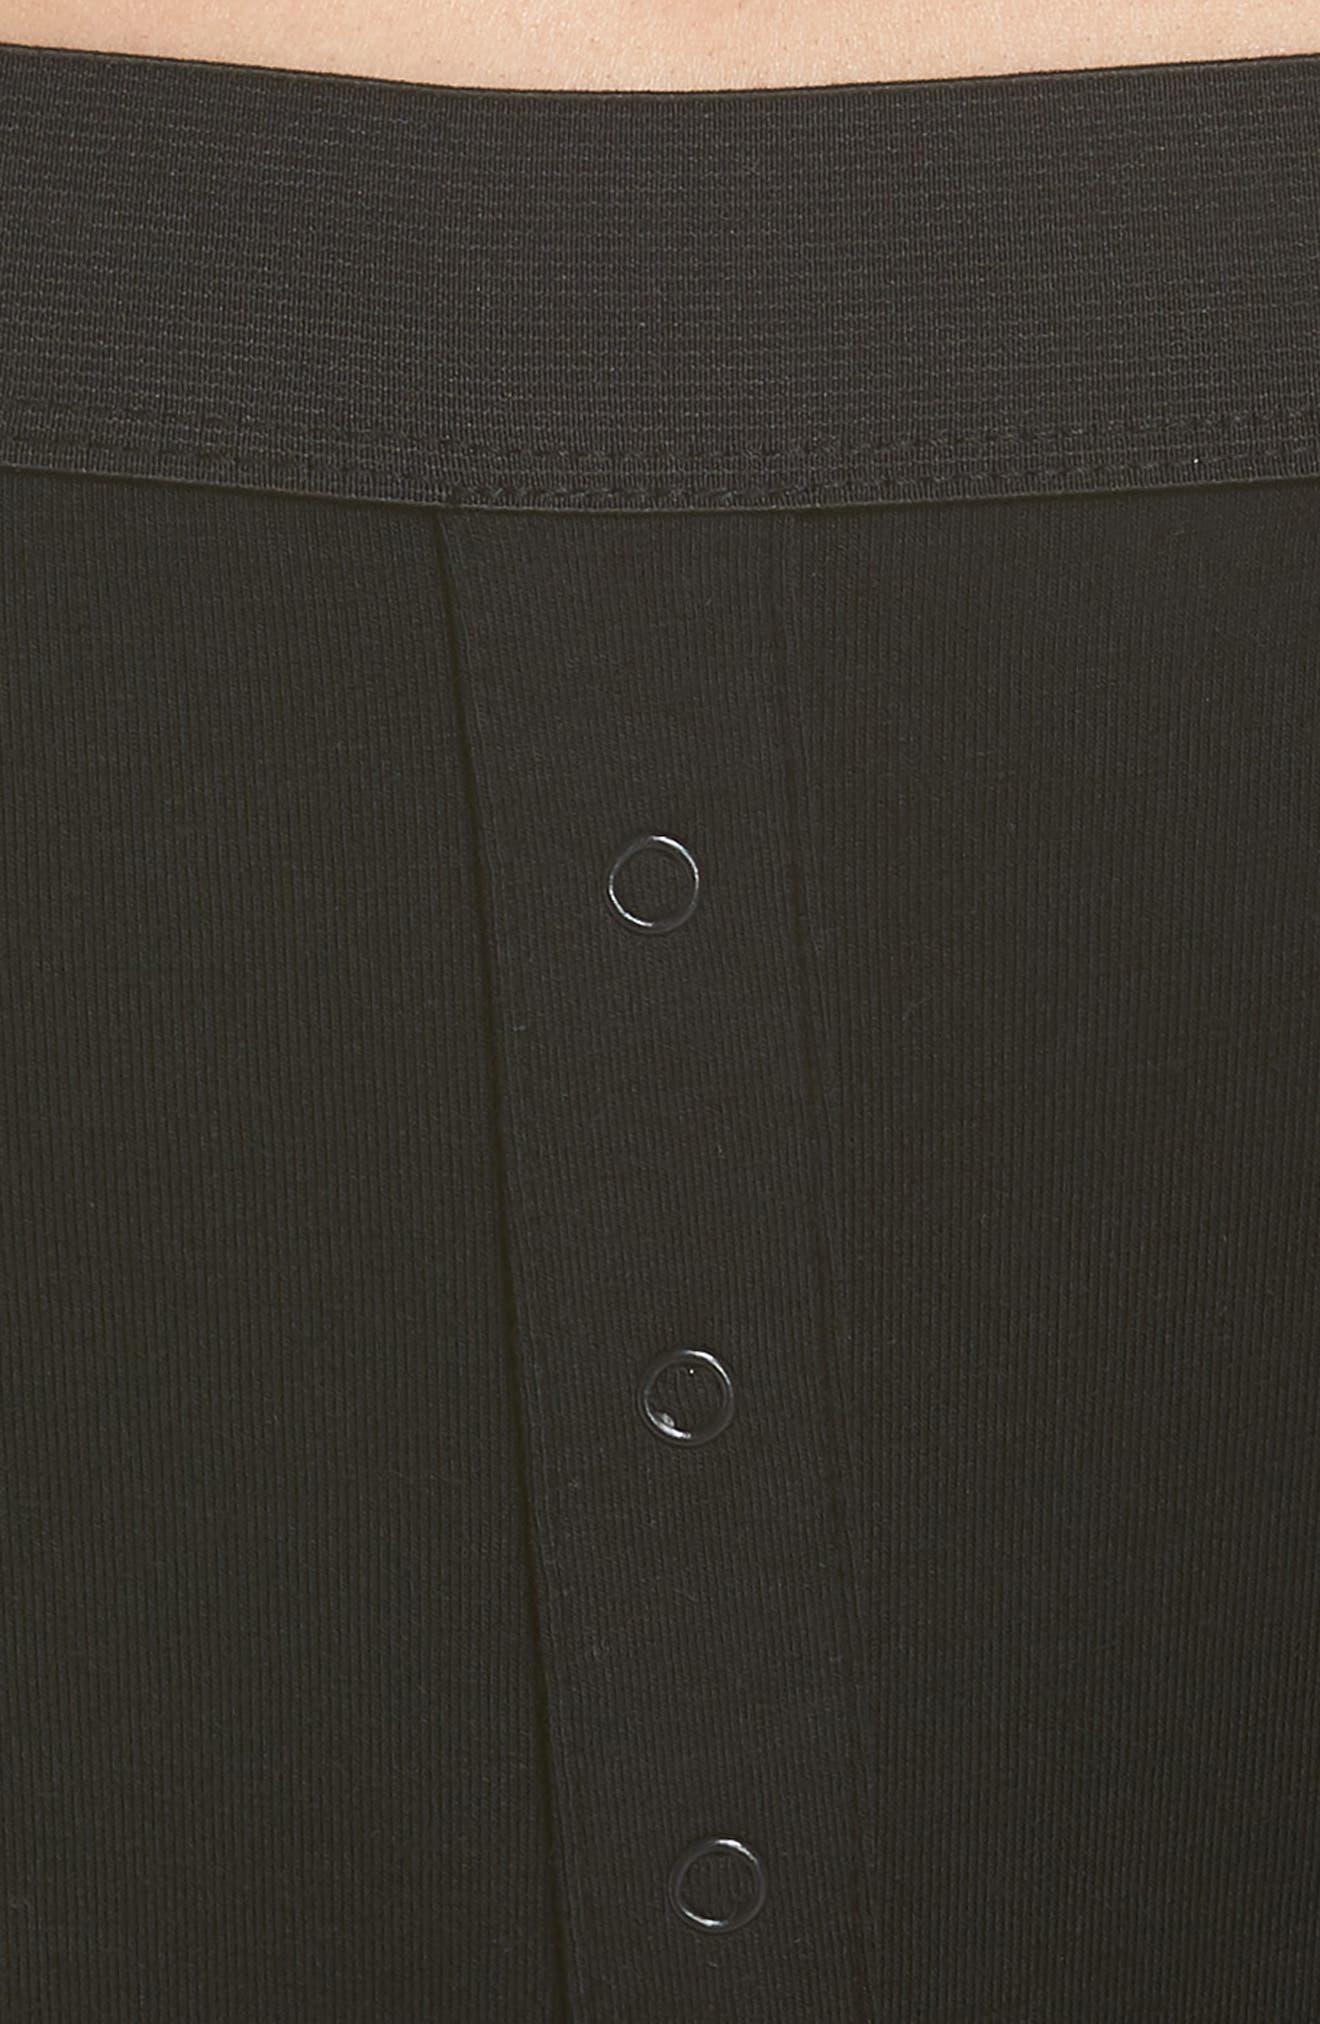 RICHER POORER, Bralette & Boxer Set, Alternate thumbnail 5, color, BLACK